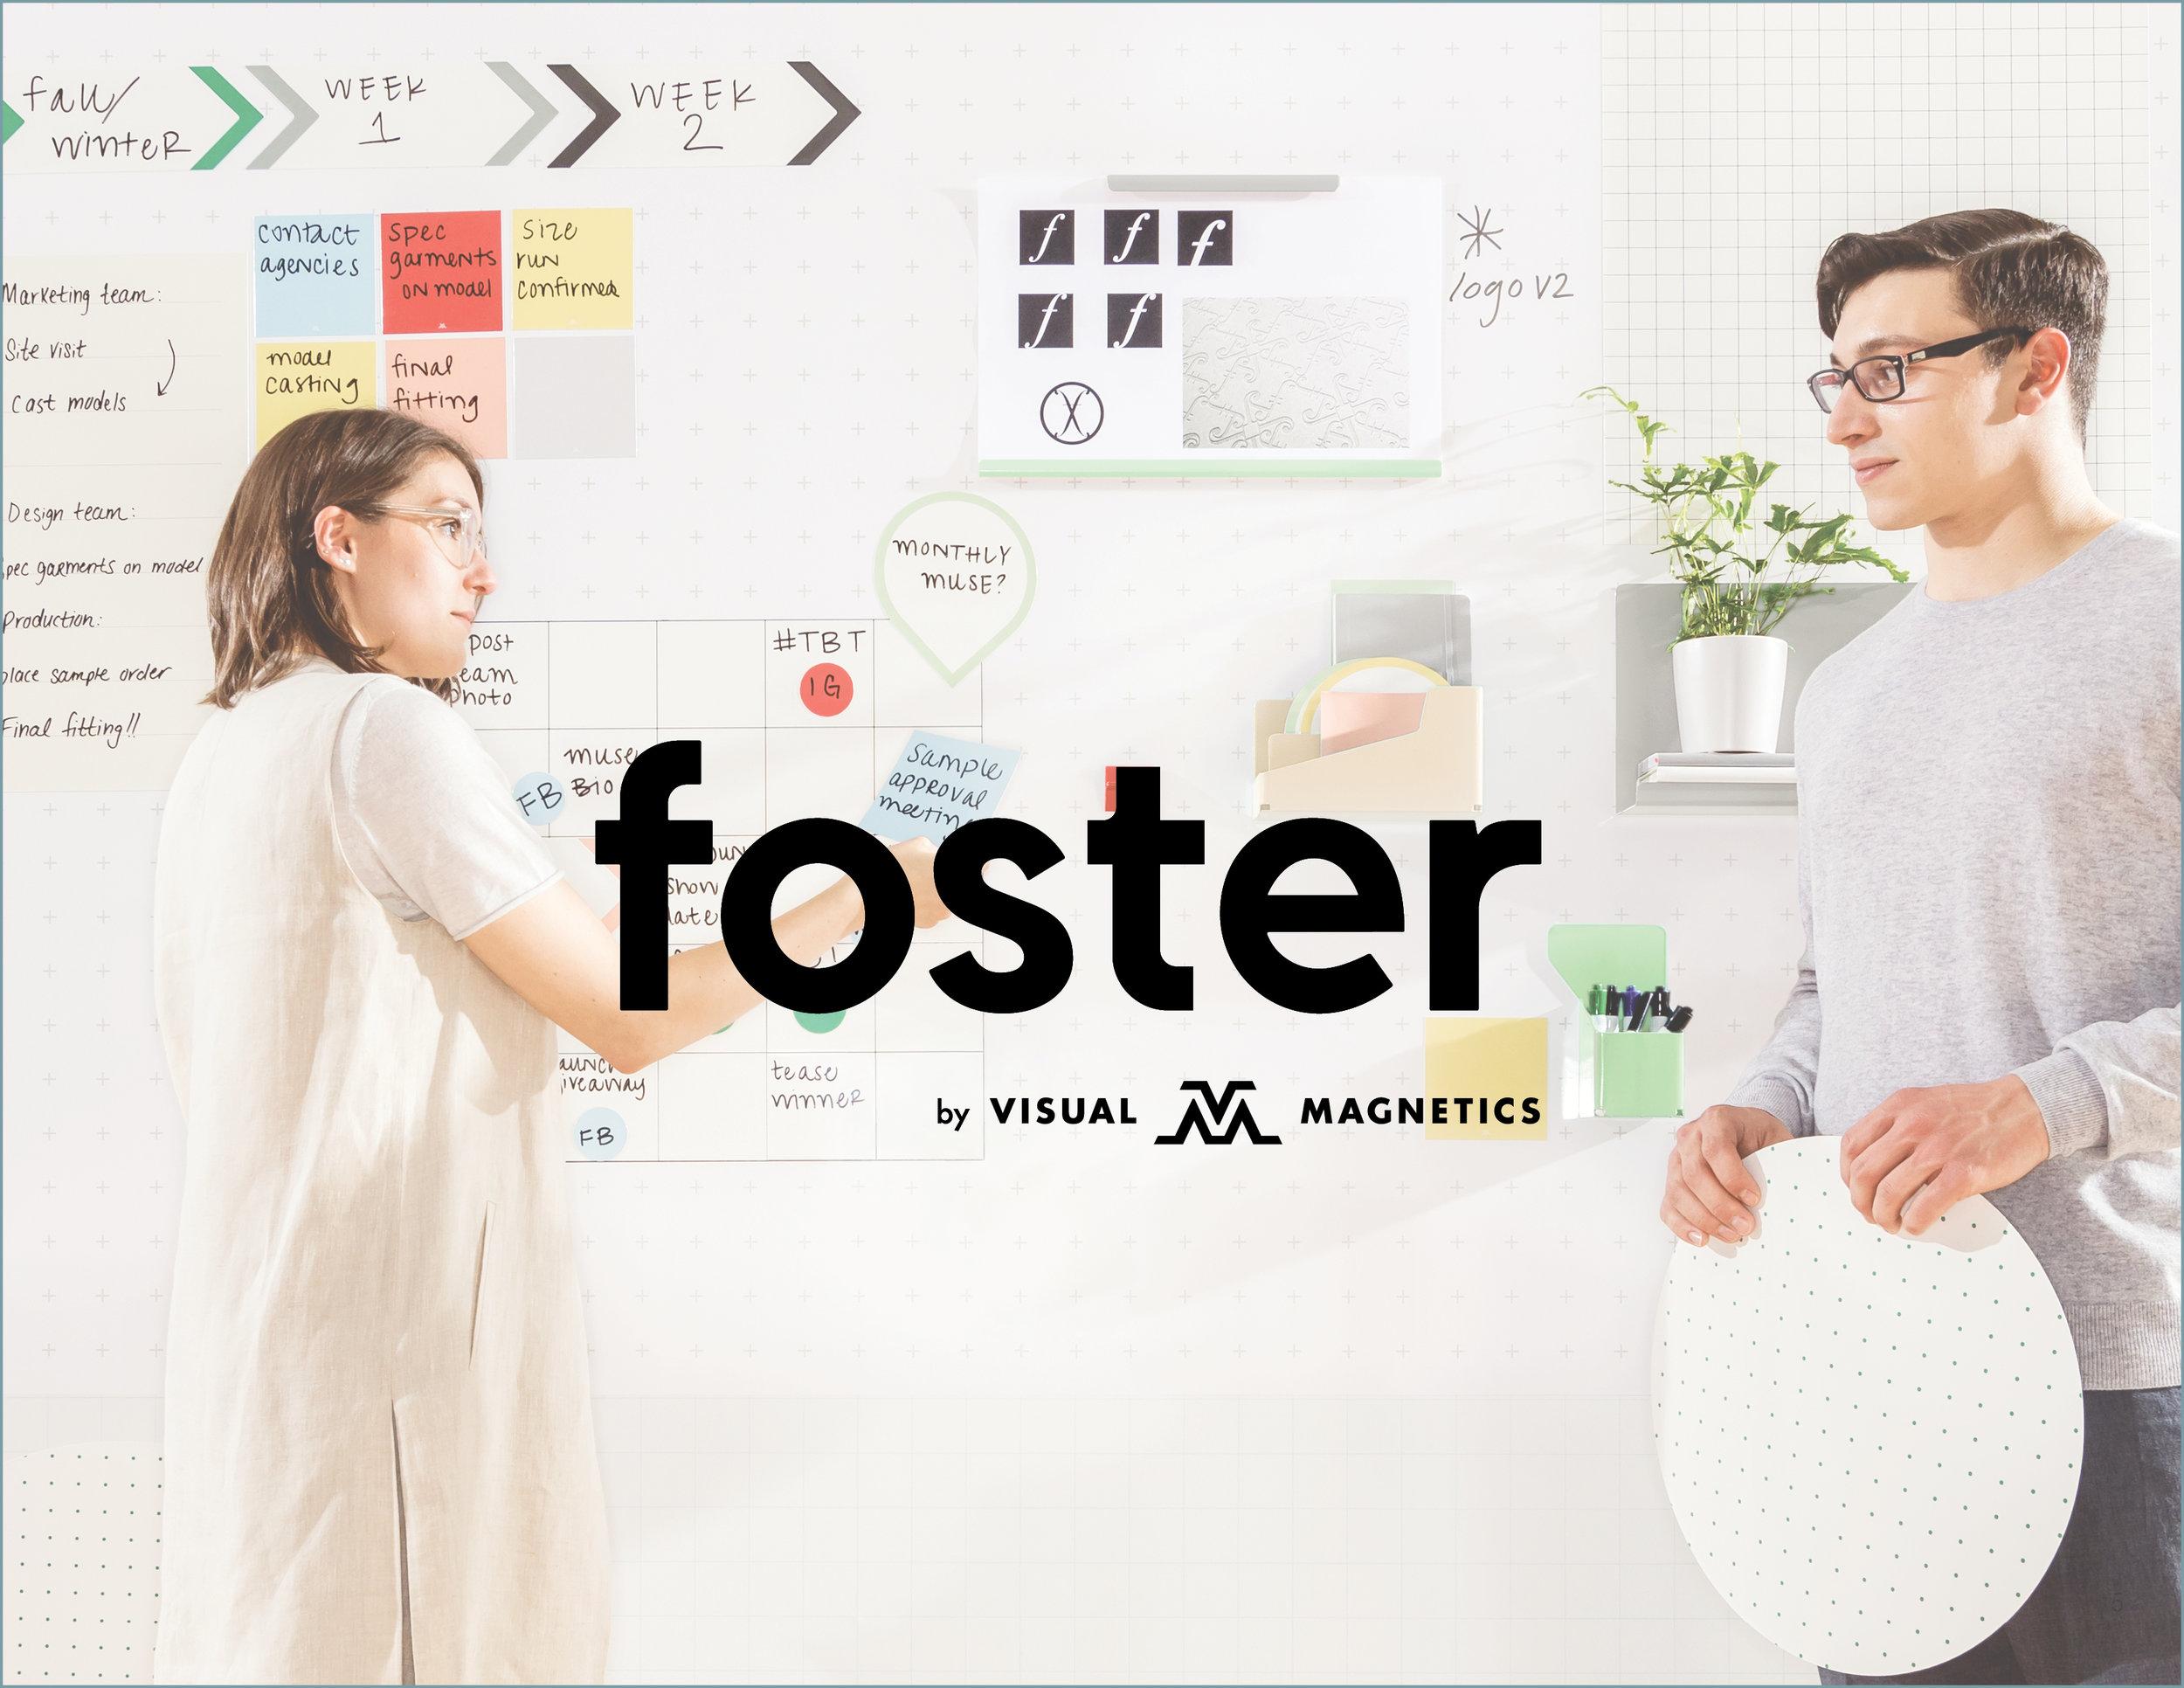 2017_09_12_Foster_forweb5.jpg